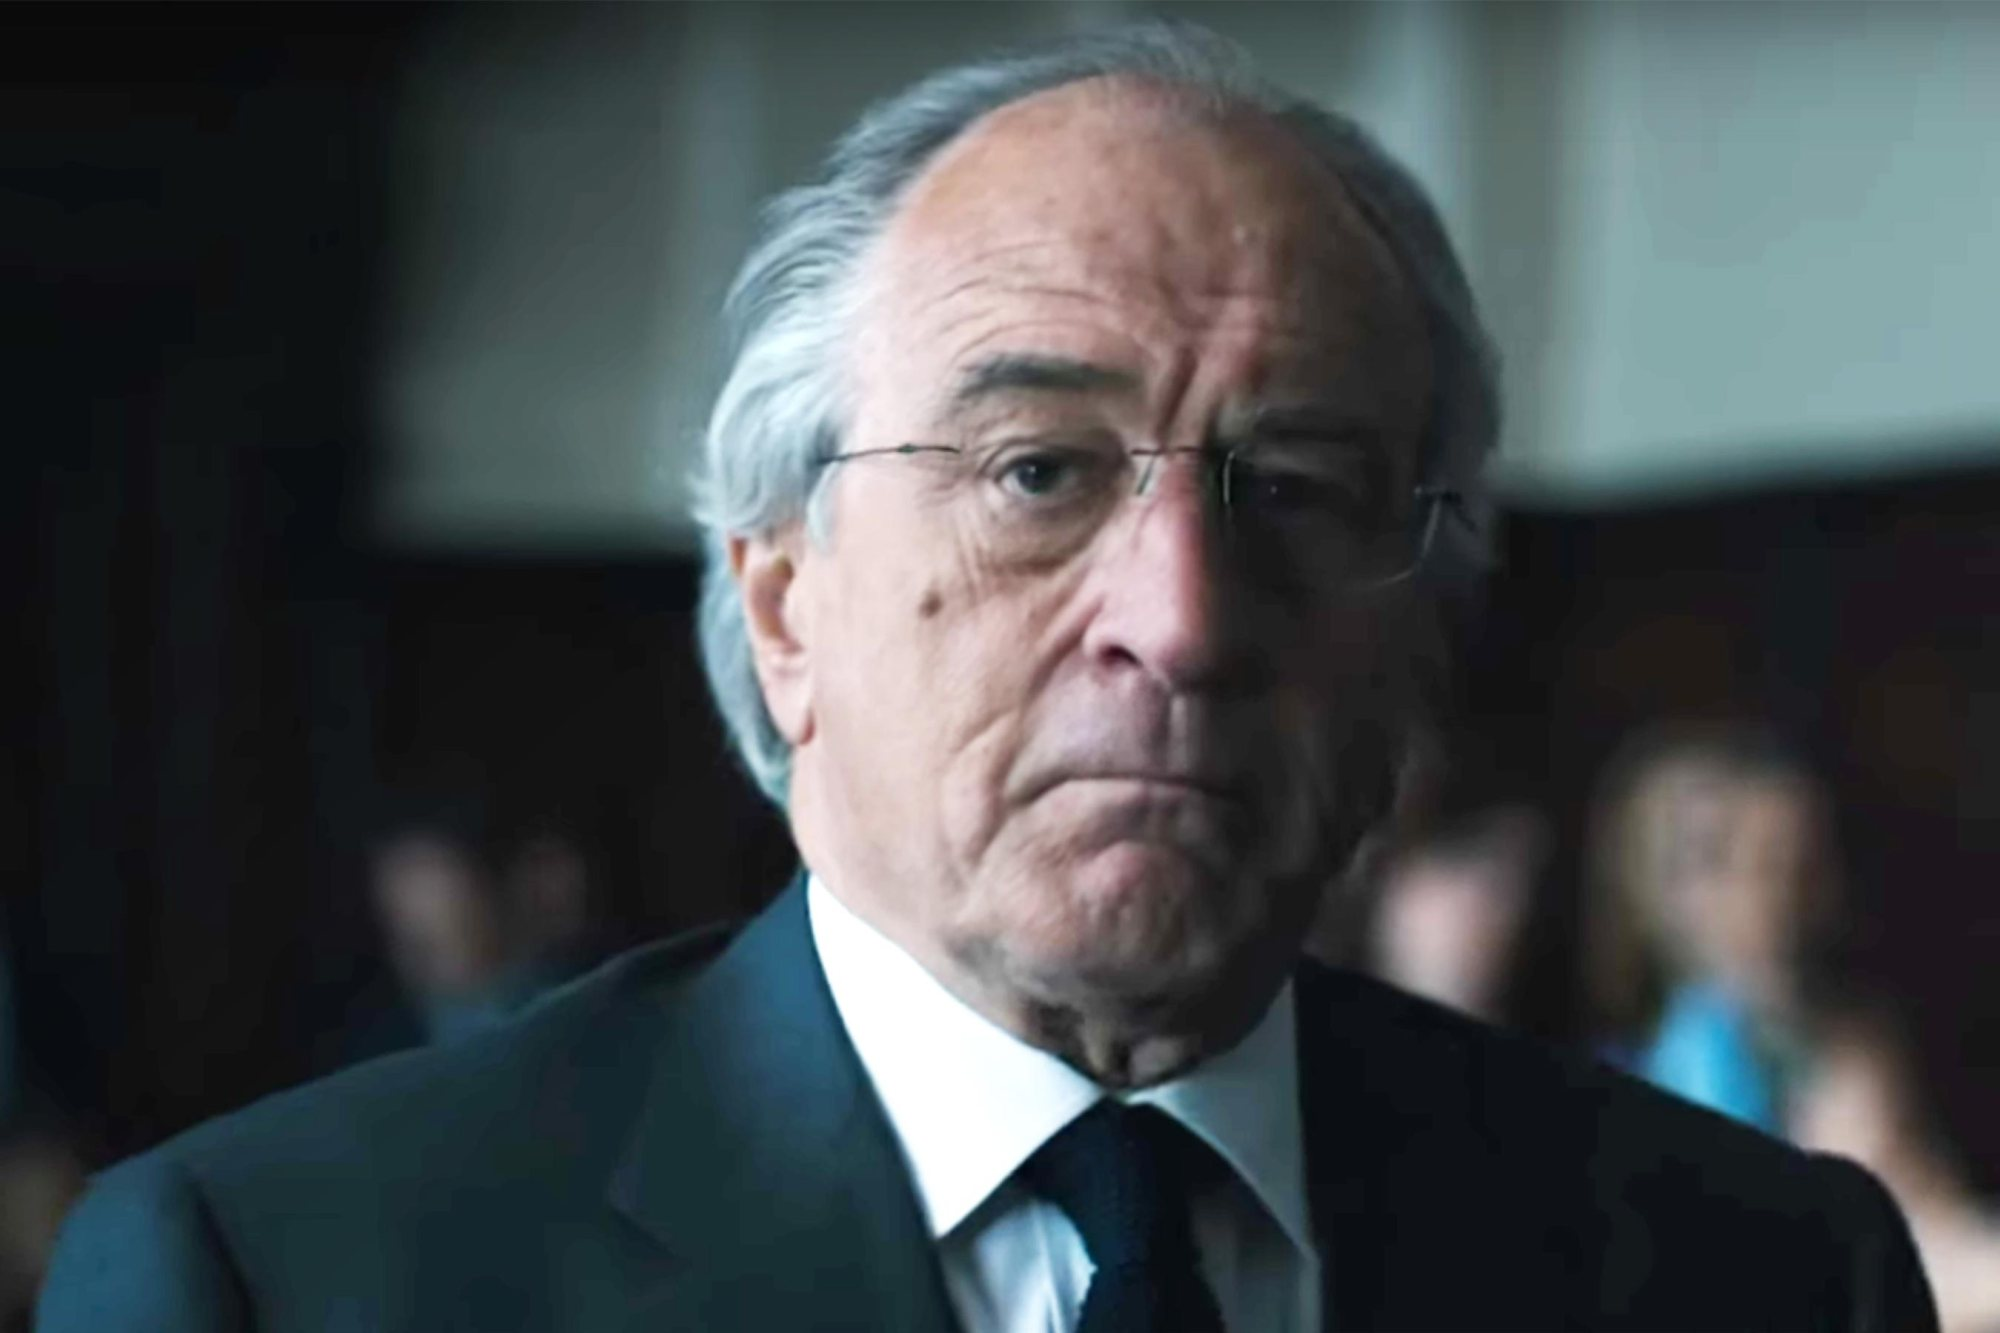 Robert De Niro, HBO, Mason Vera Paine, Steve Weisman, Bernie Madoff, Ponzi-scheme, Wizard of Lies